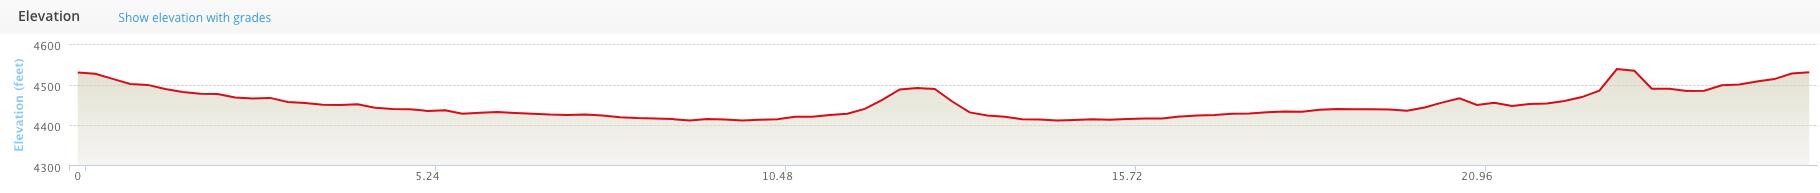 Elevation profile for full marathon